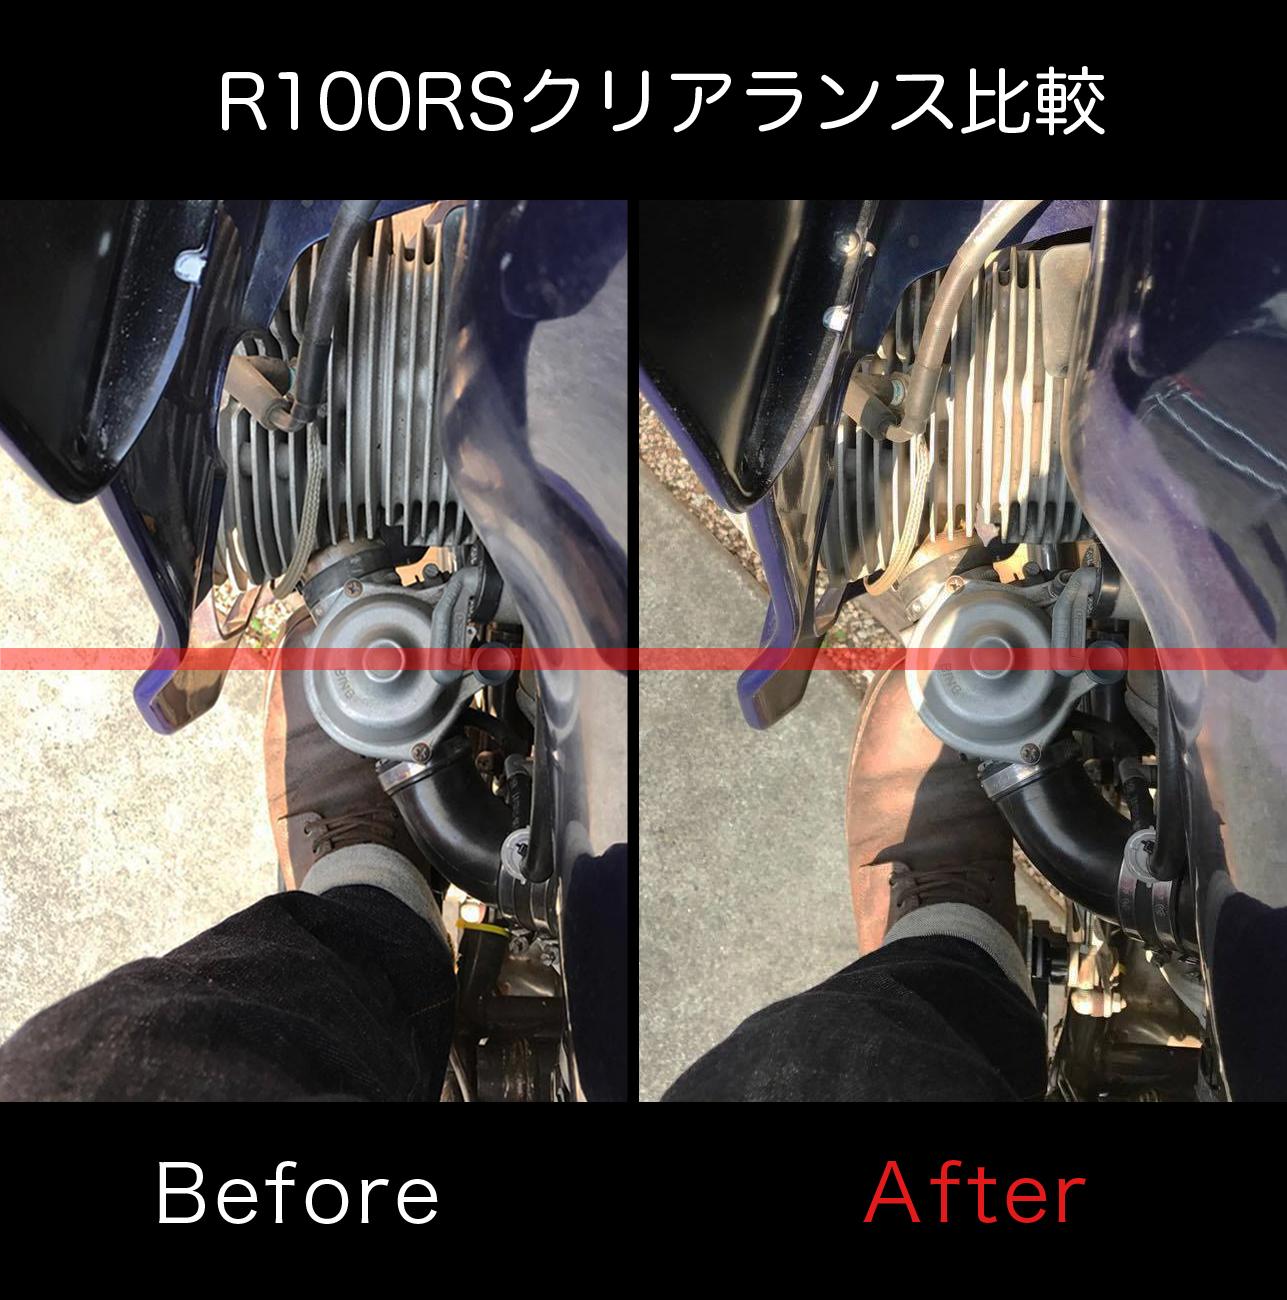 bmw r100rs モノレバー専用バックステップ純正ステップとの比較画像